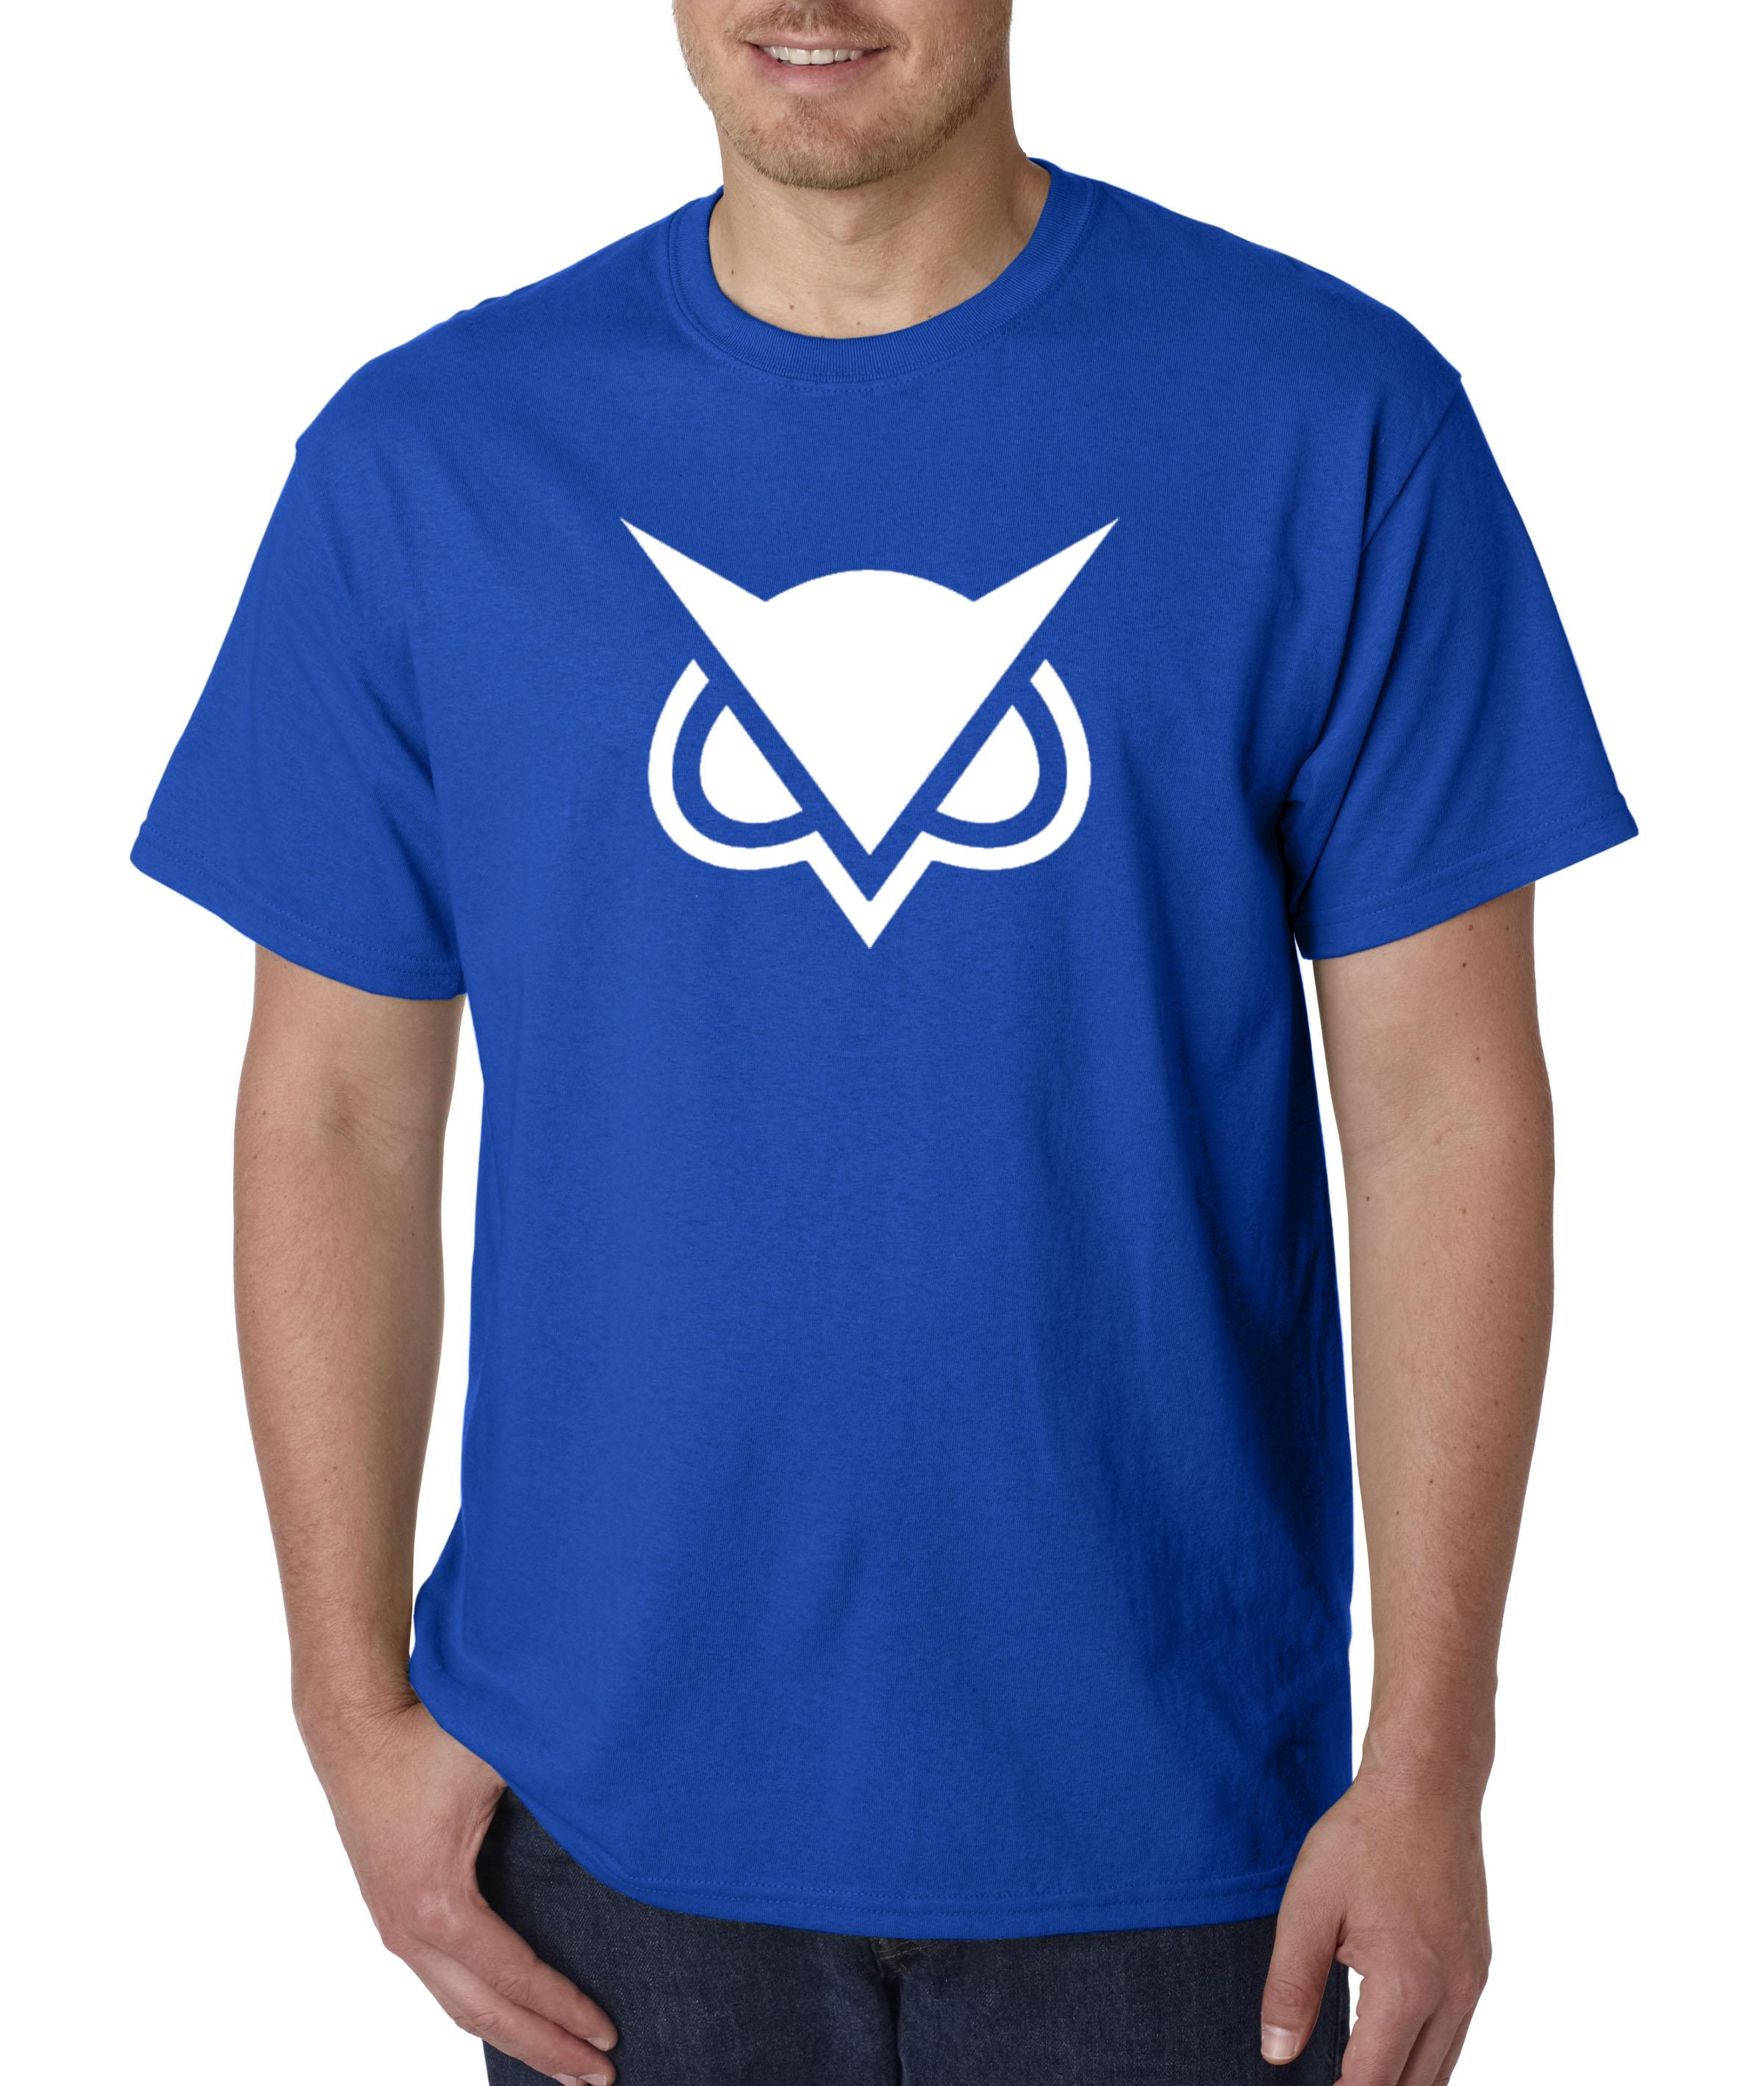 747 - Unisex T-Shirt Vanoss Owl Gaming VG Logo 2XL Royal Blue